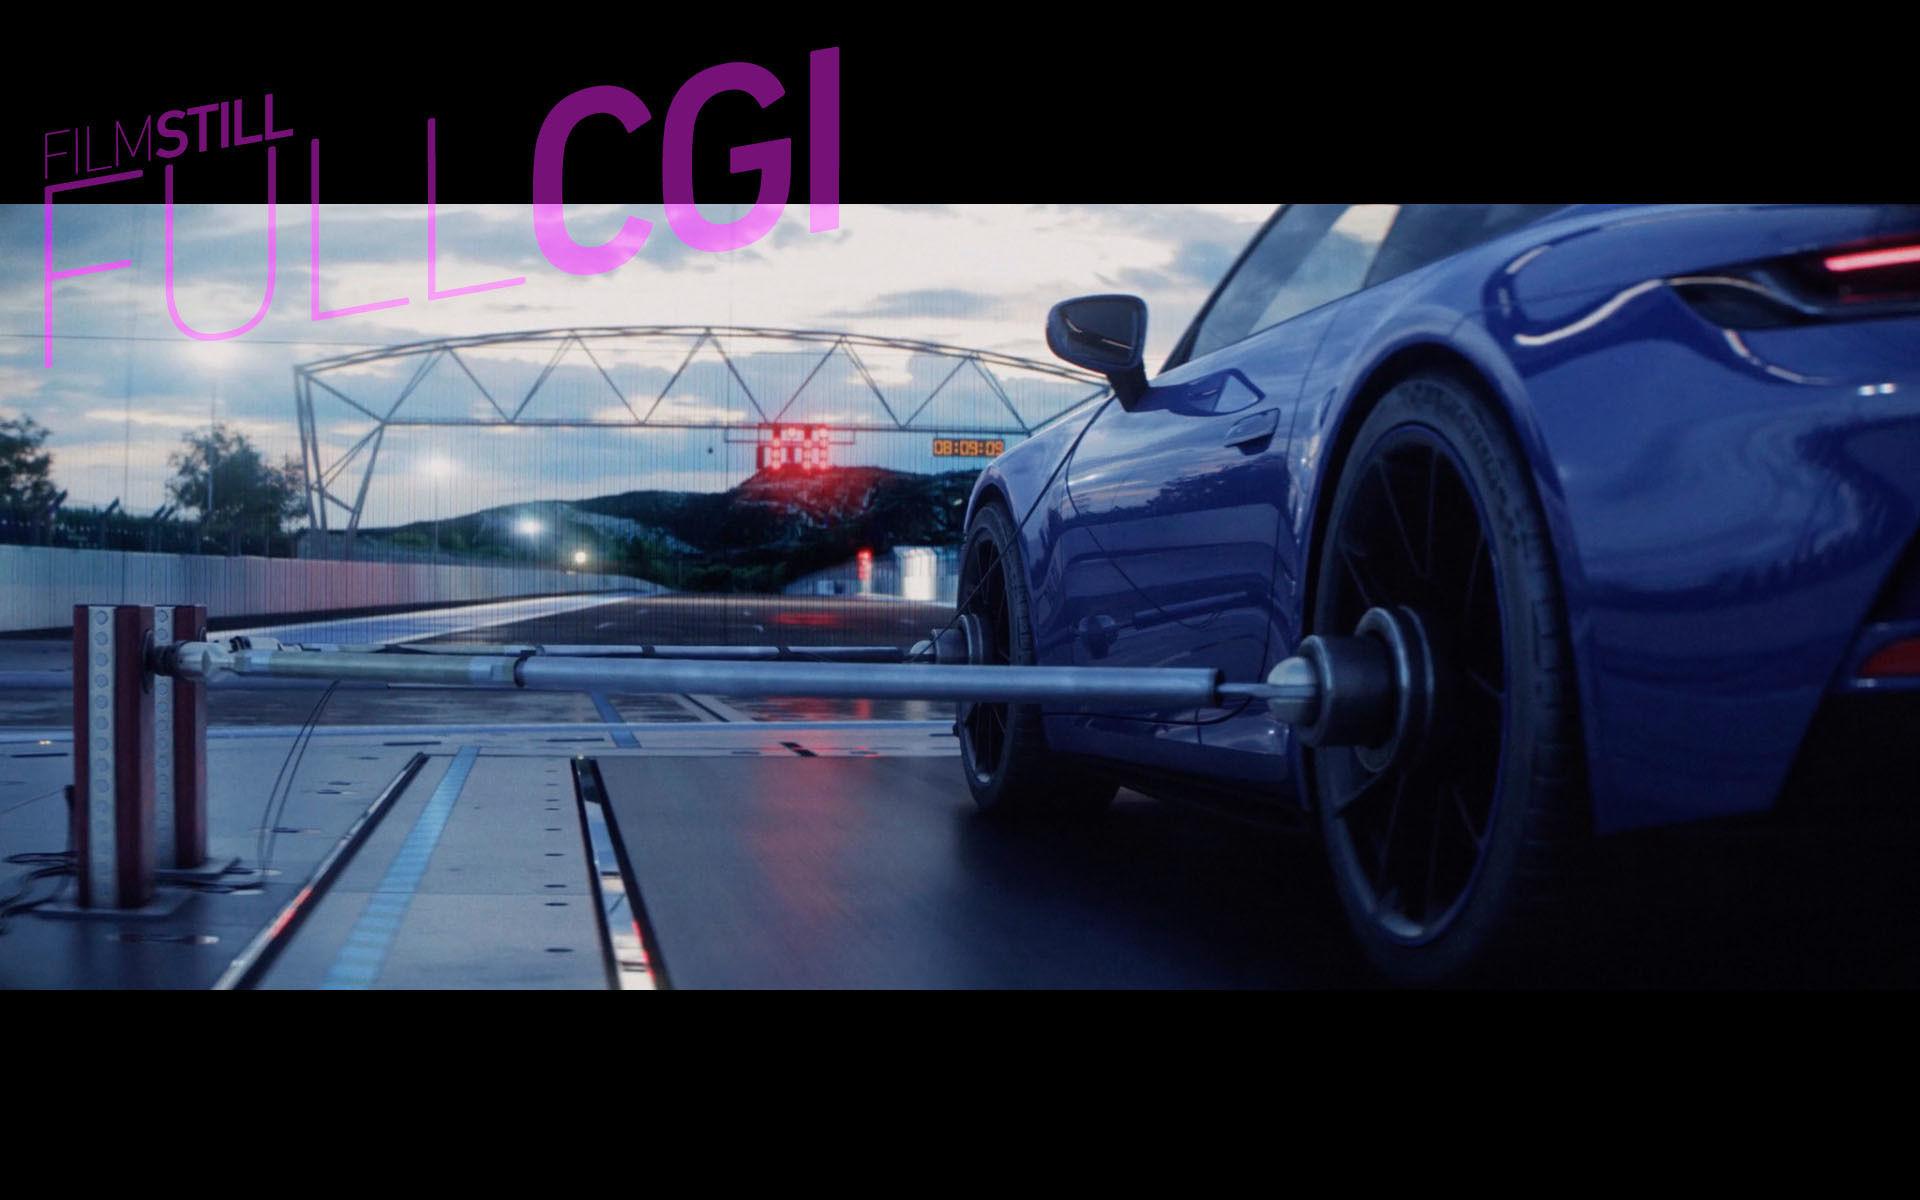 RECOM FILM : On the Track with the PORSCHE 911 GT3 - FULL-CGI Film-Stills